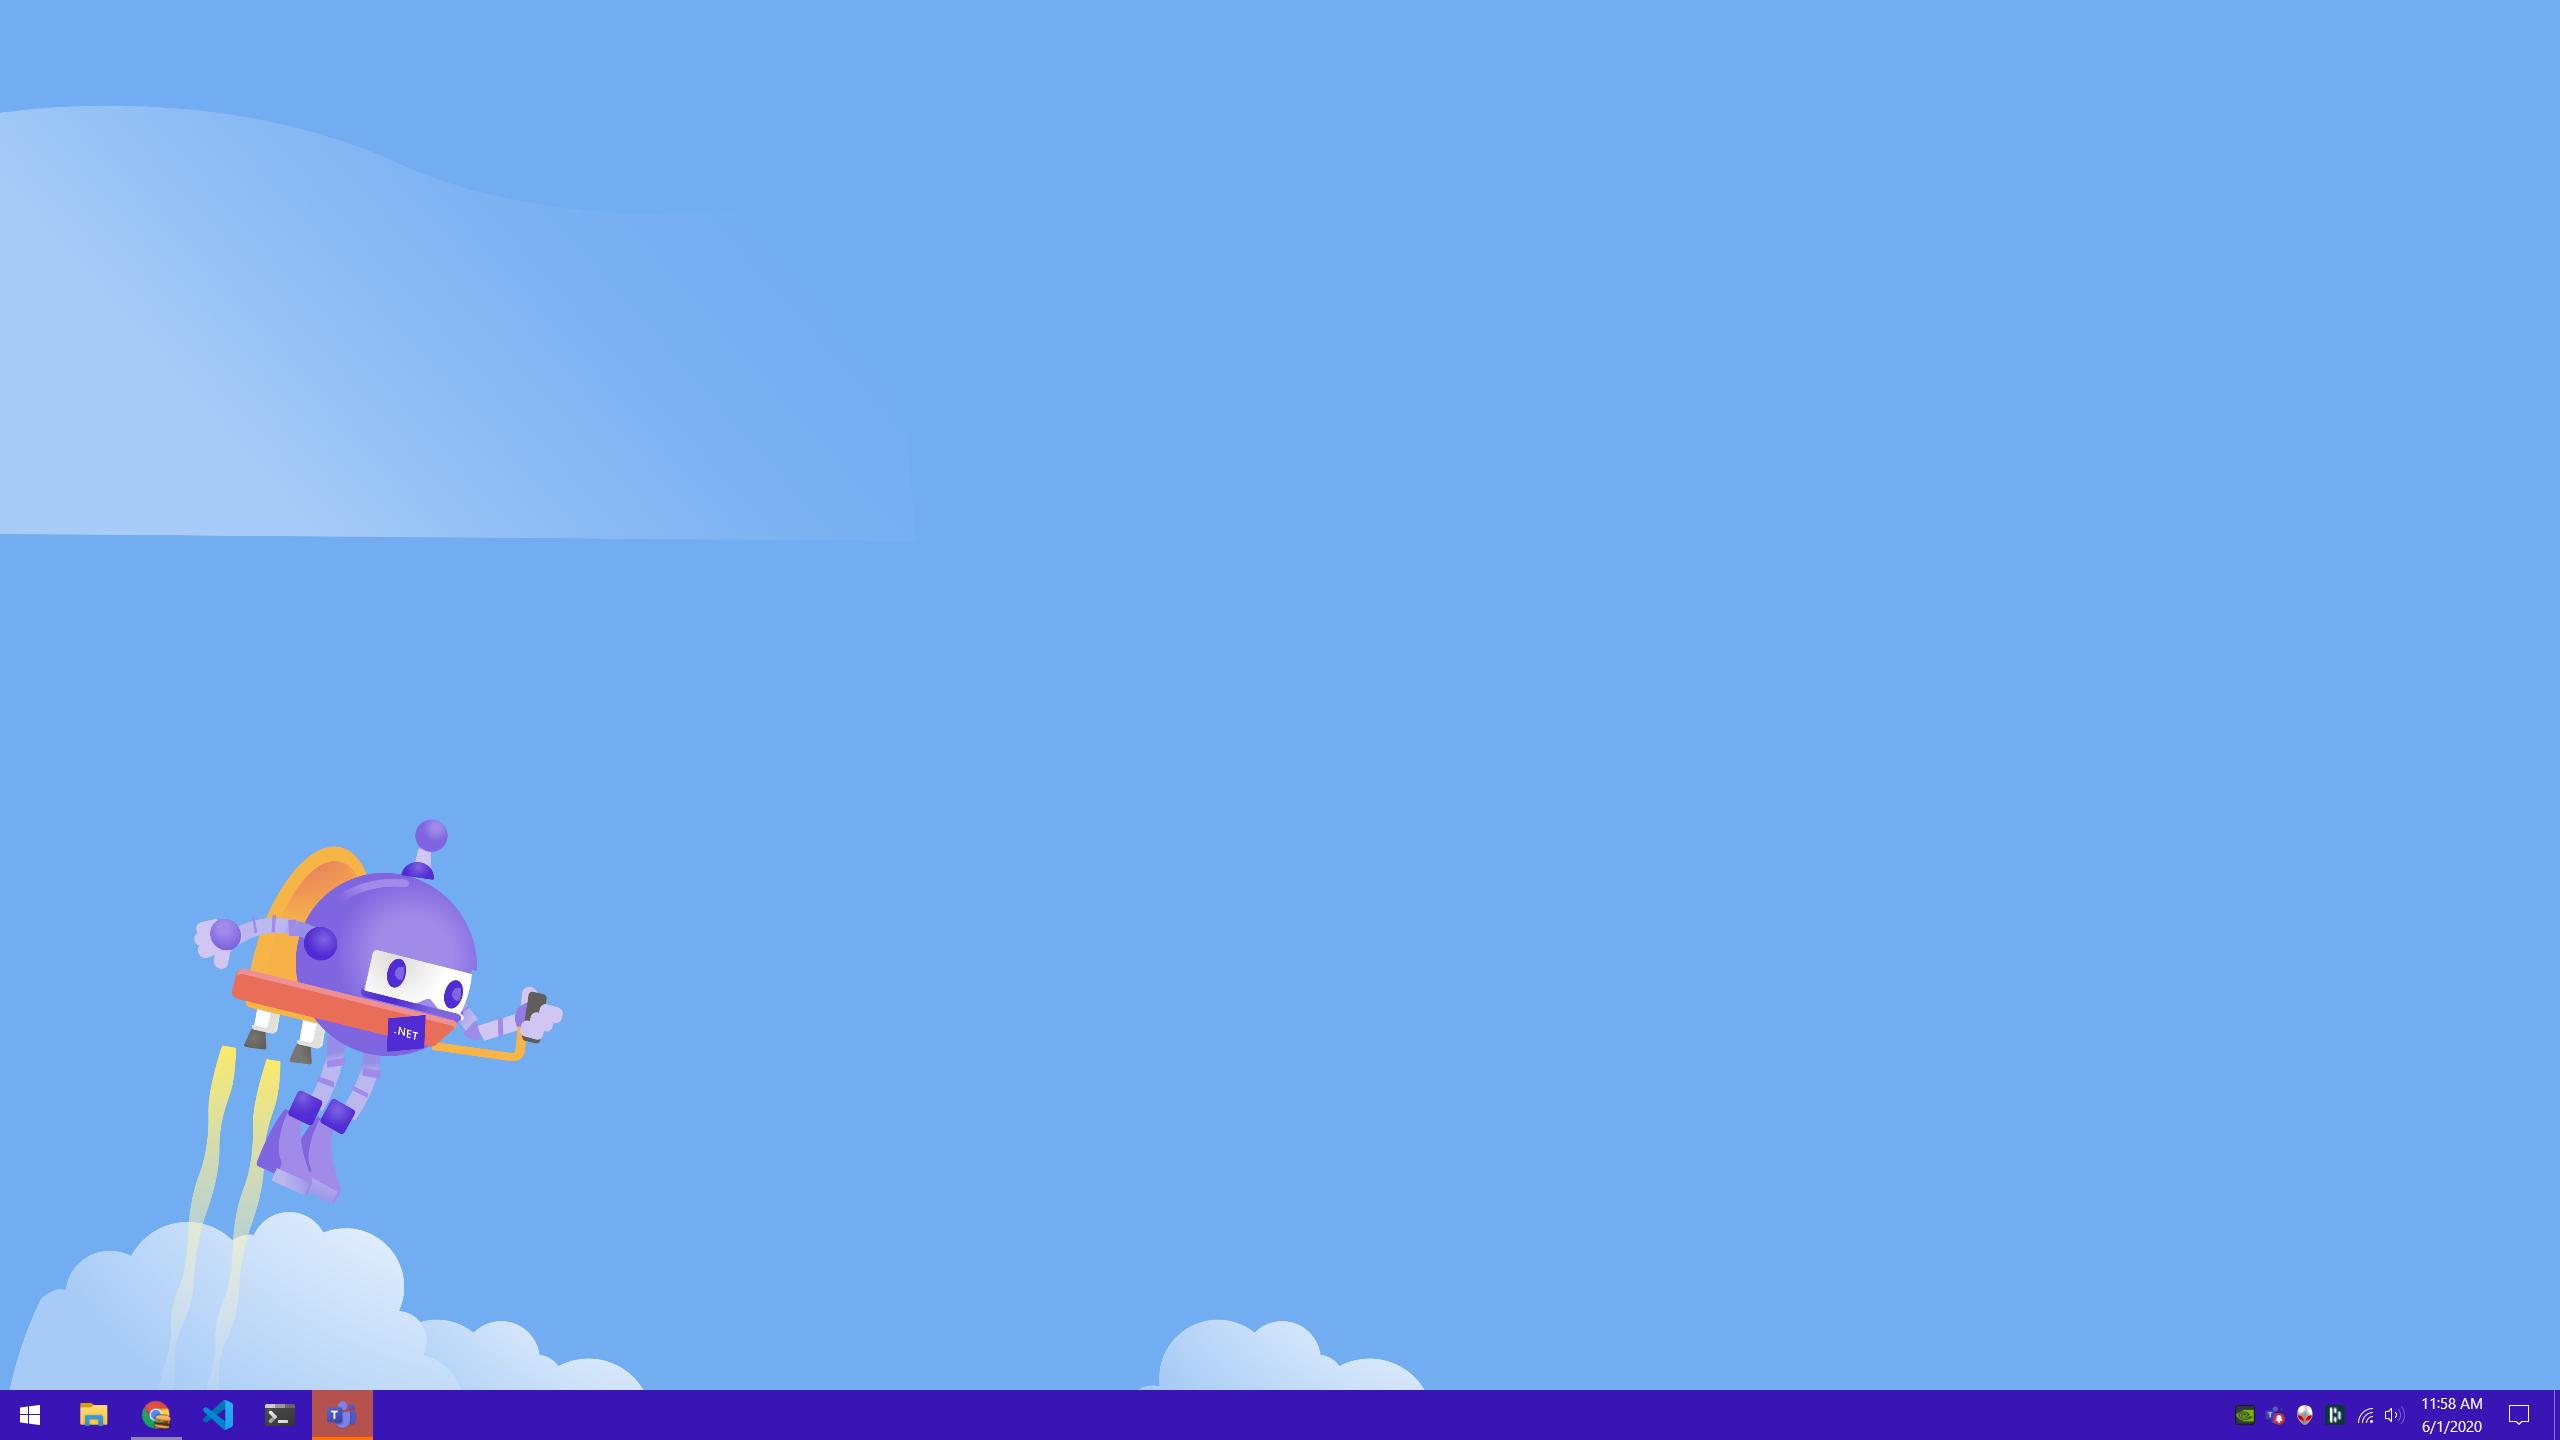 .NET Bot flying a jetpack